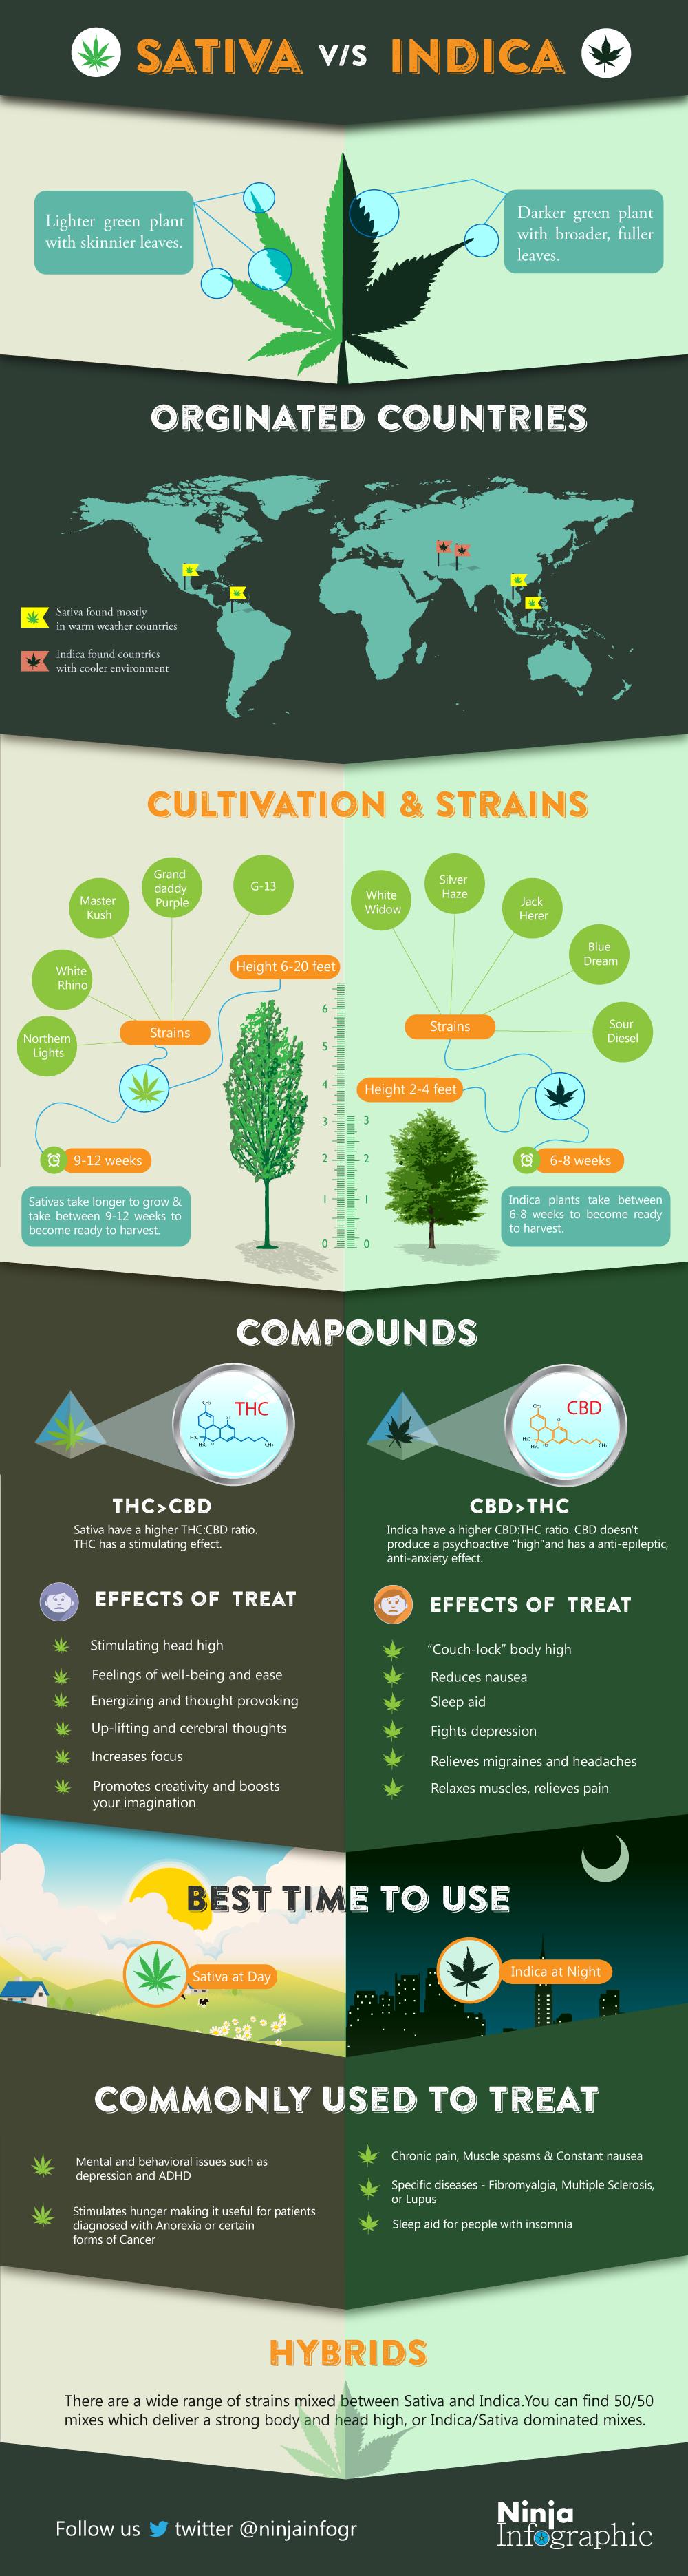 Infographic: Sativa vs Indica #infographic